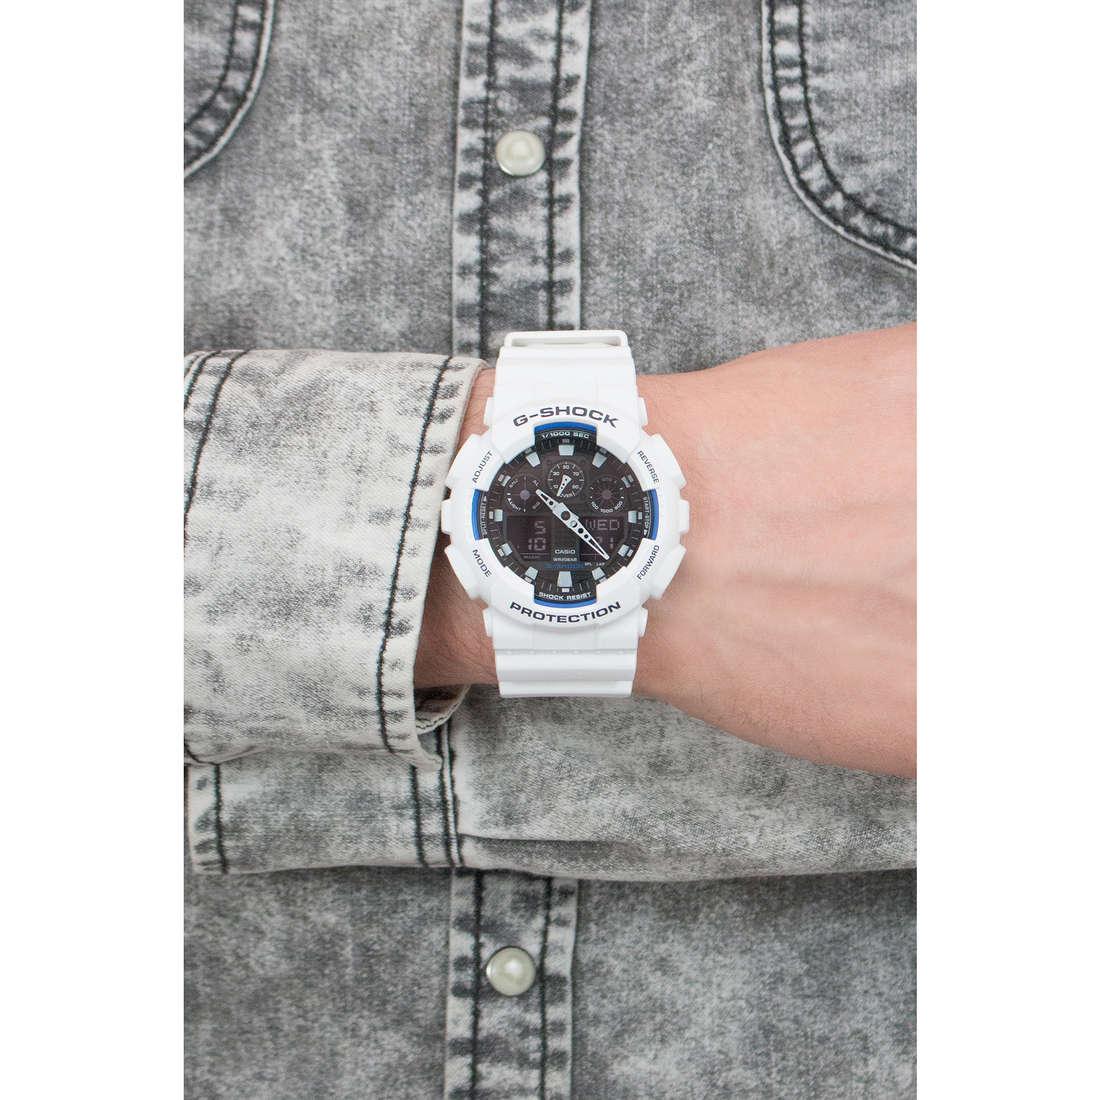 Casio digitali G-Shock uomo GA-100B-7AER indosso